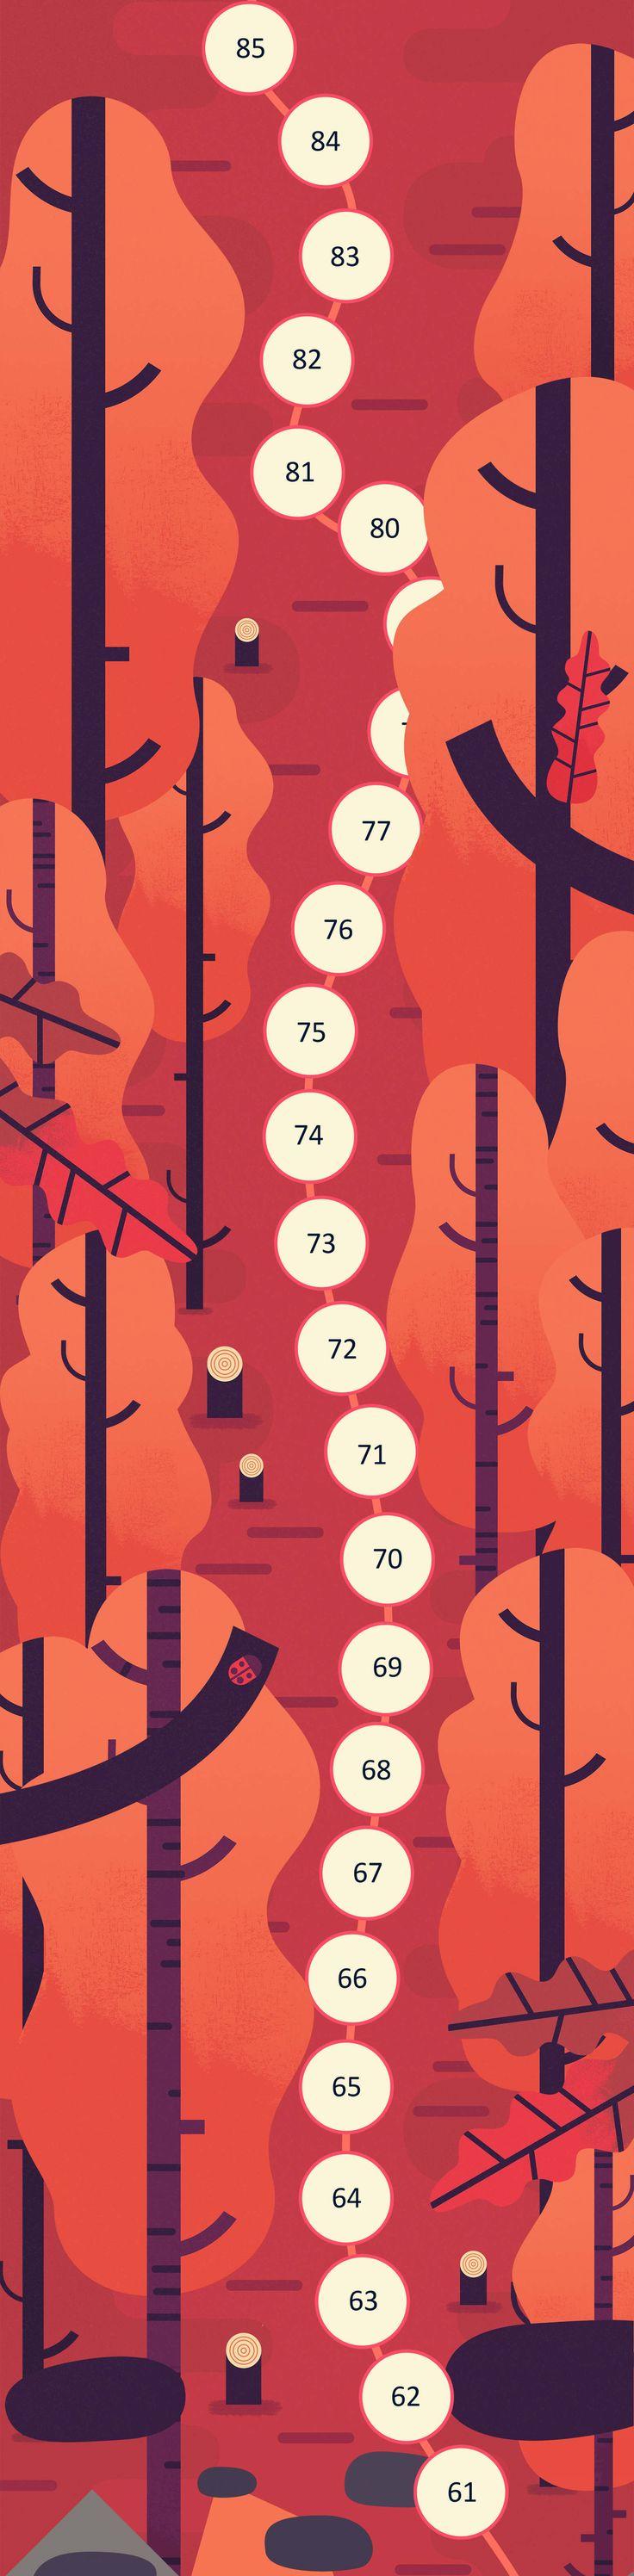 TwoDots - Owen Davey Illustration